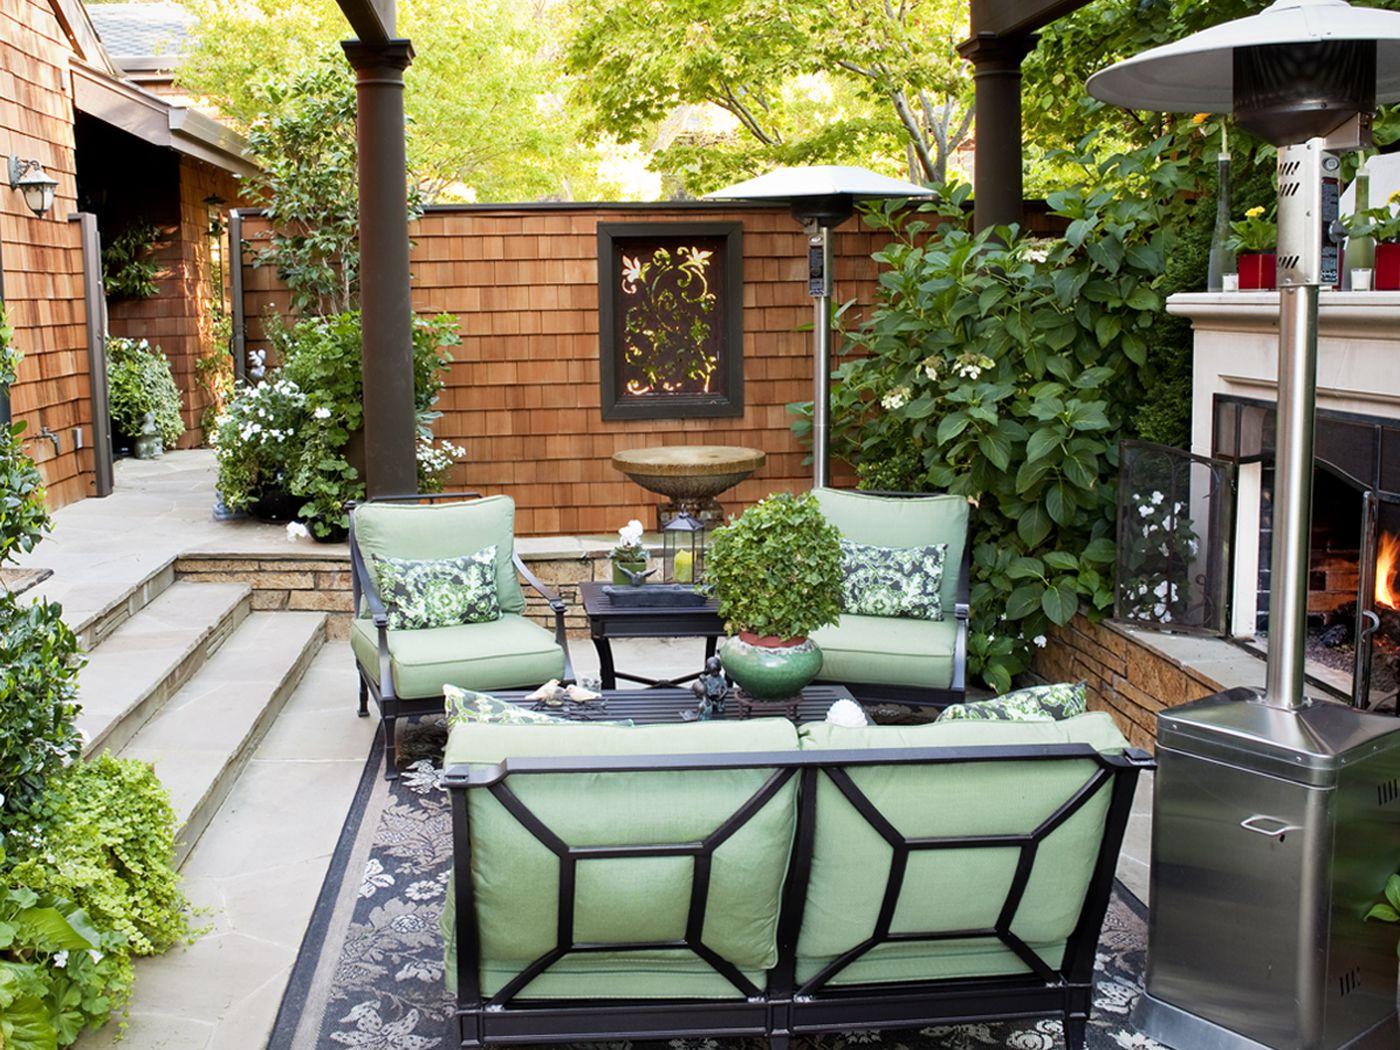 14 design ideas for pleasant patios